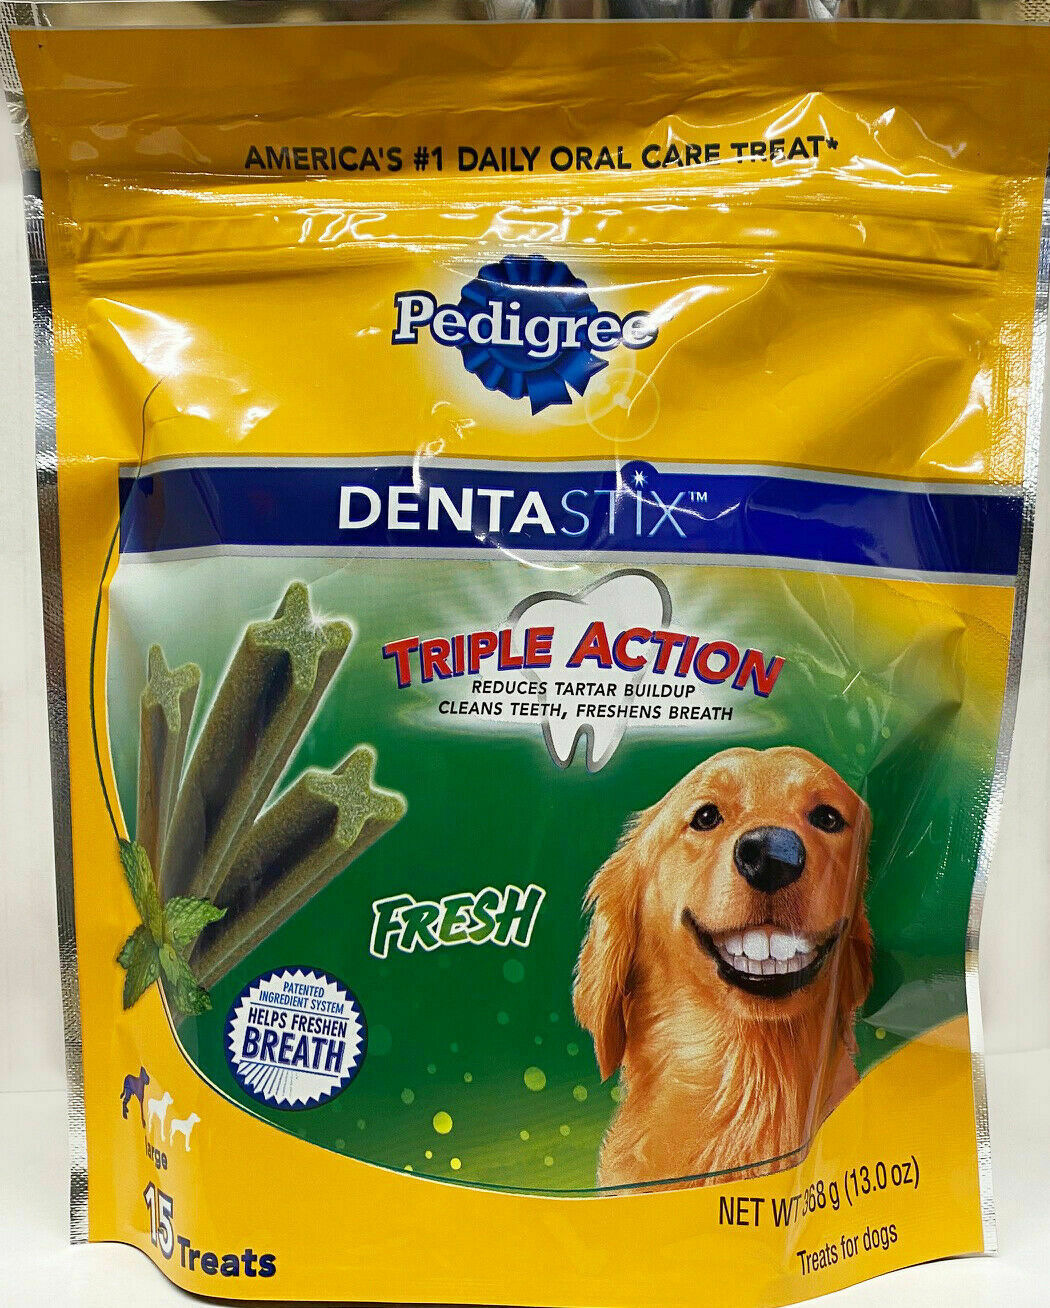 Pedigree DENTASTIX Fresh treats for Large 30+ pound Dogs, 15 treats